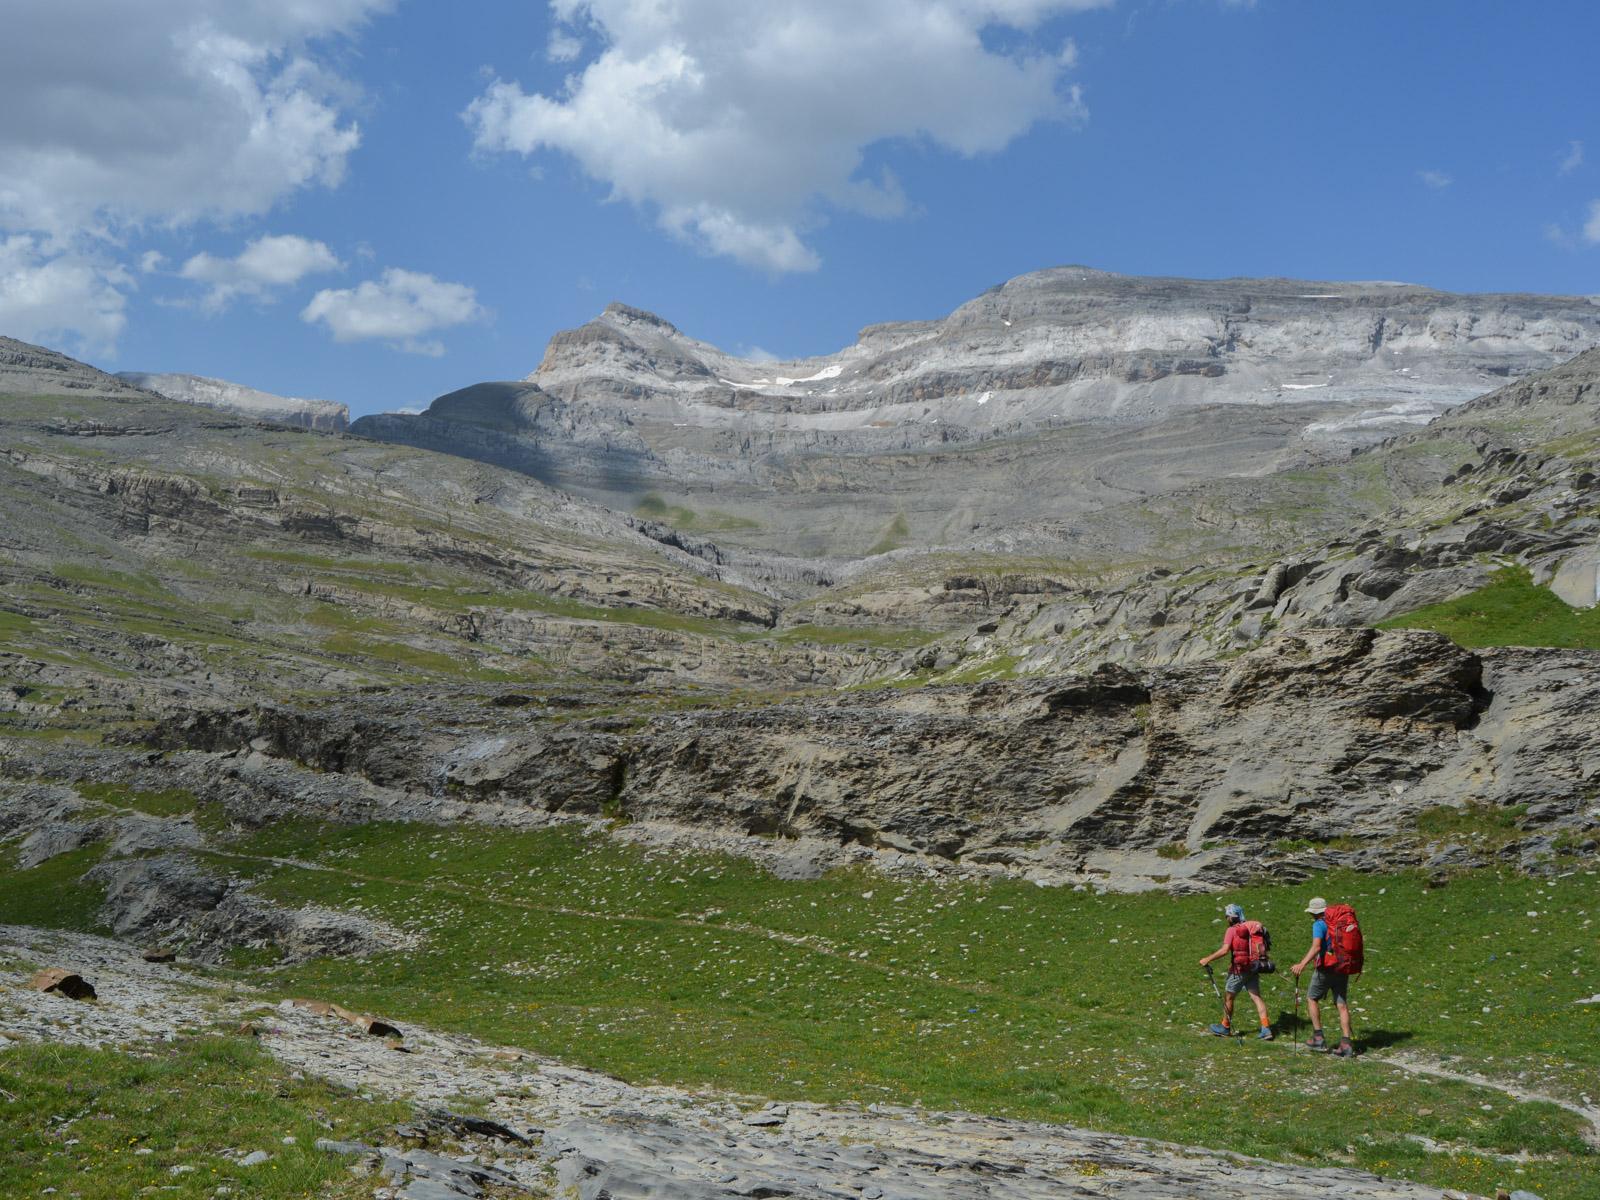 Monte Perdido et Faja de las Flores, Jour 2, Ordesa, Aragon, Espagne 34